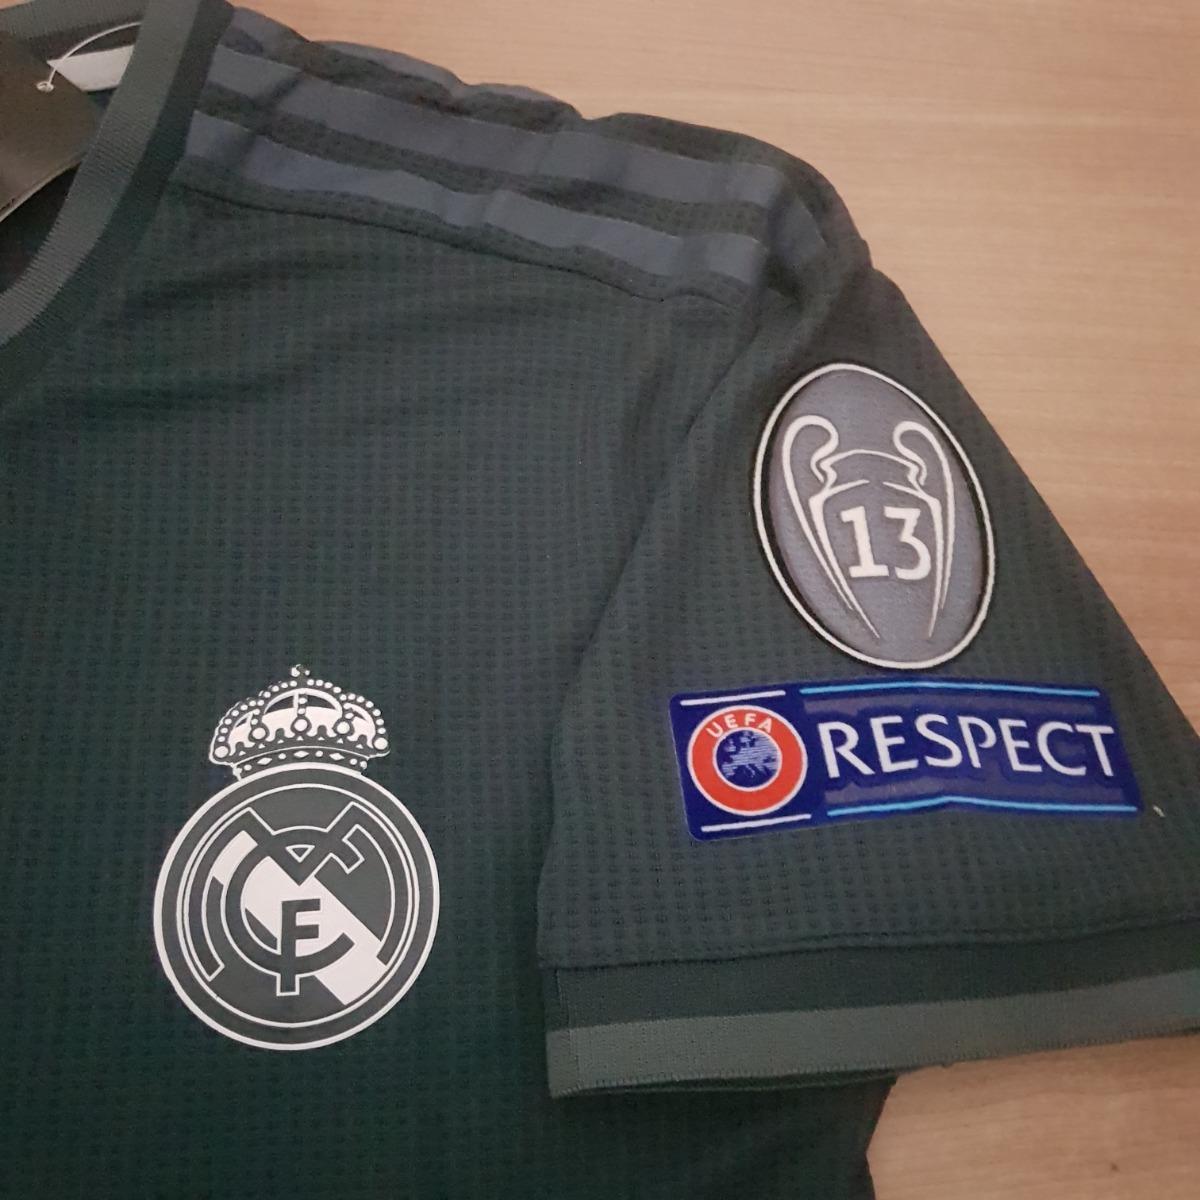 74c90ce2e Camisa Real Madrid Away Climachill 2019 Ucl Pronta Entrega - R  179 ...